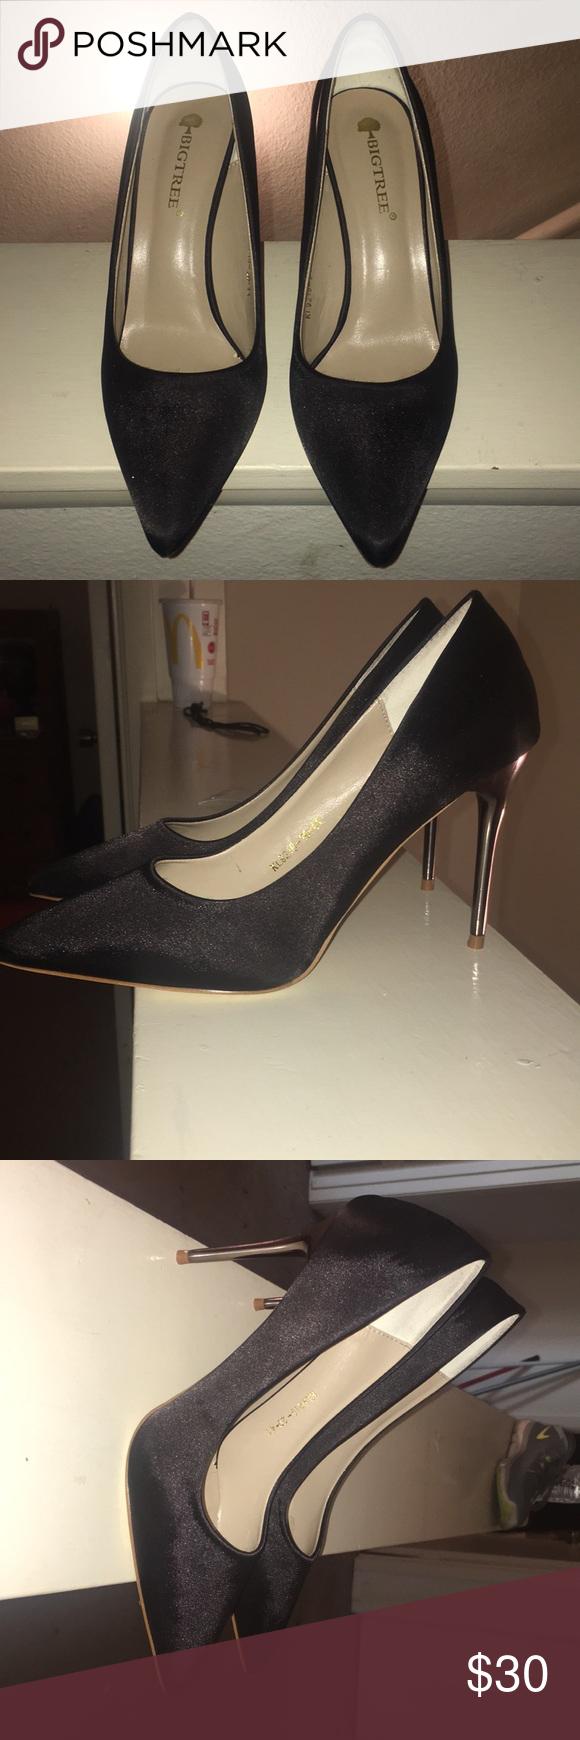 c66f84b46682 Black pointed toe heels brand new Never Worn Brand new big tree Shoes Heels